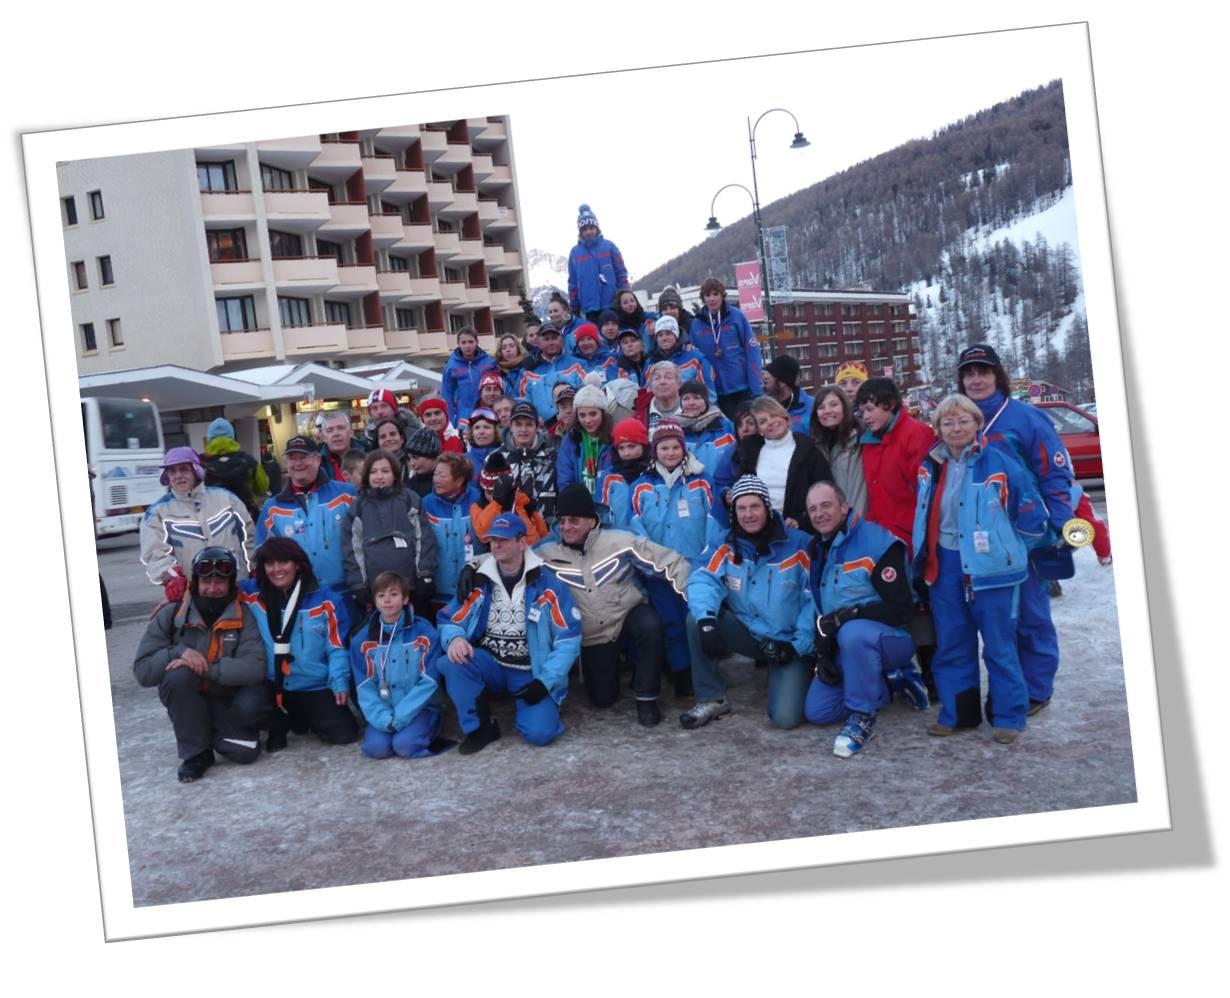 CSM Seynois - Le ski club de La Seyne sur mer